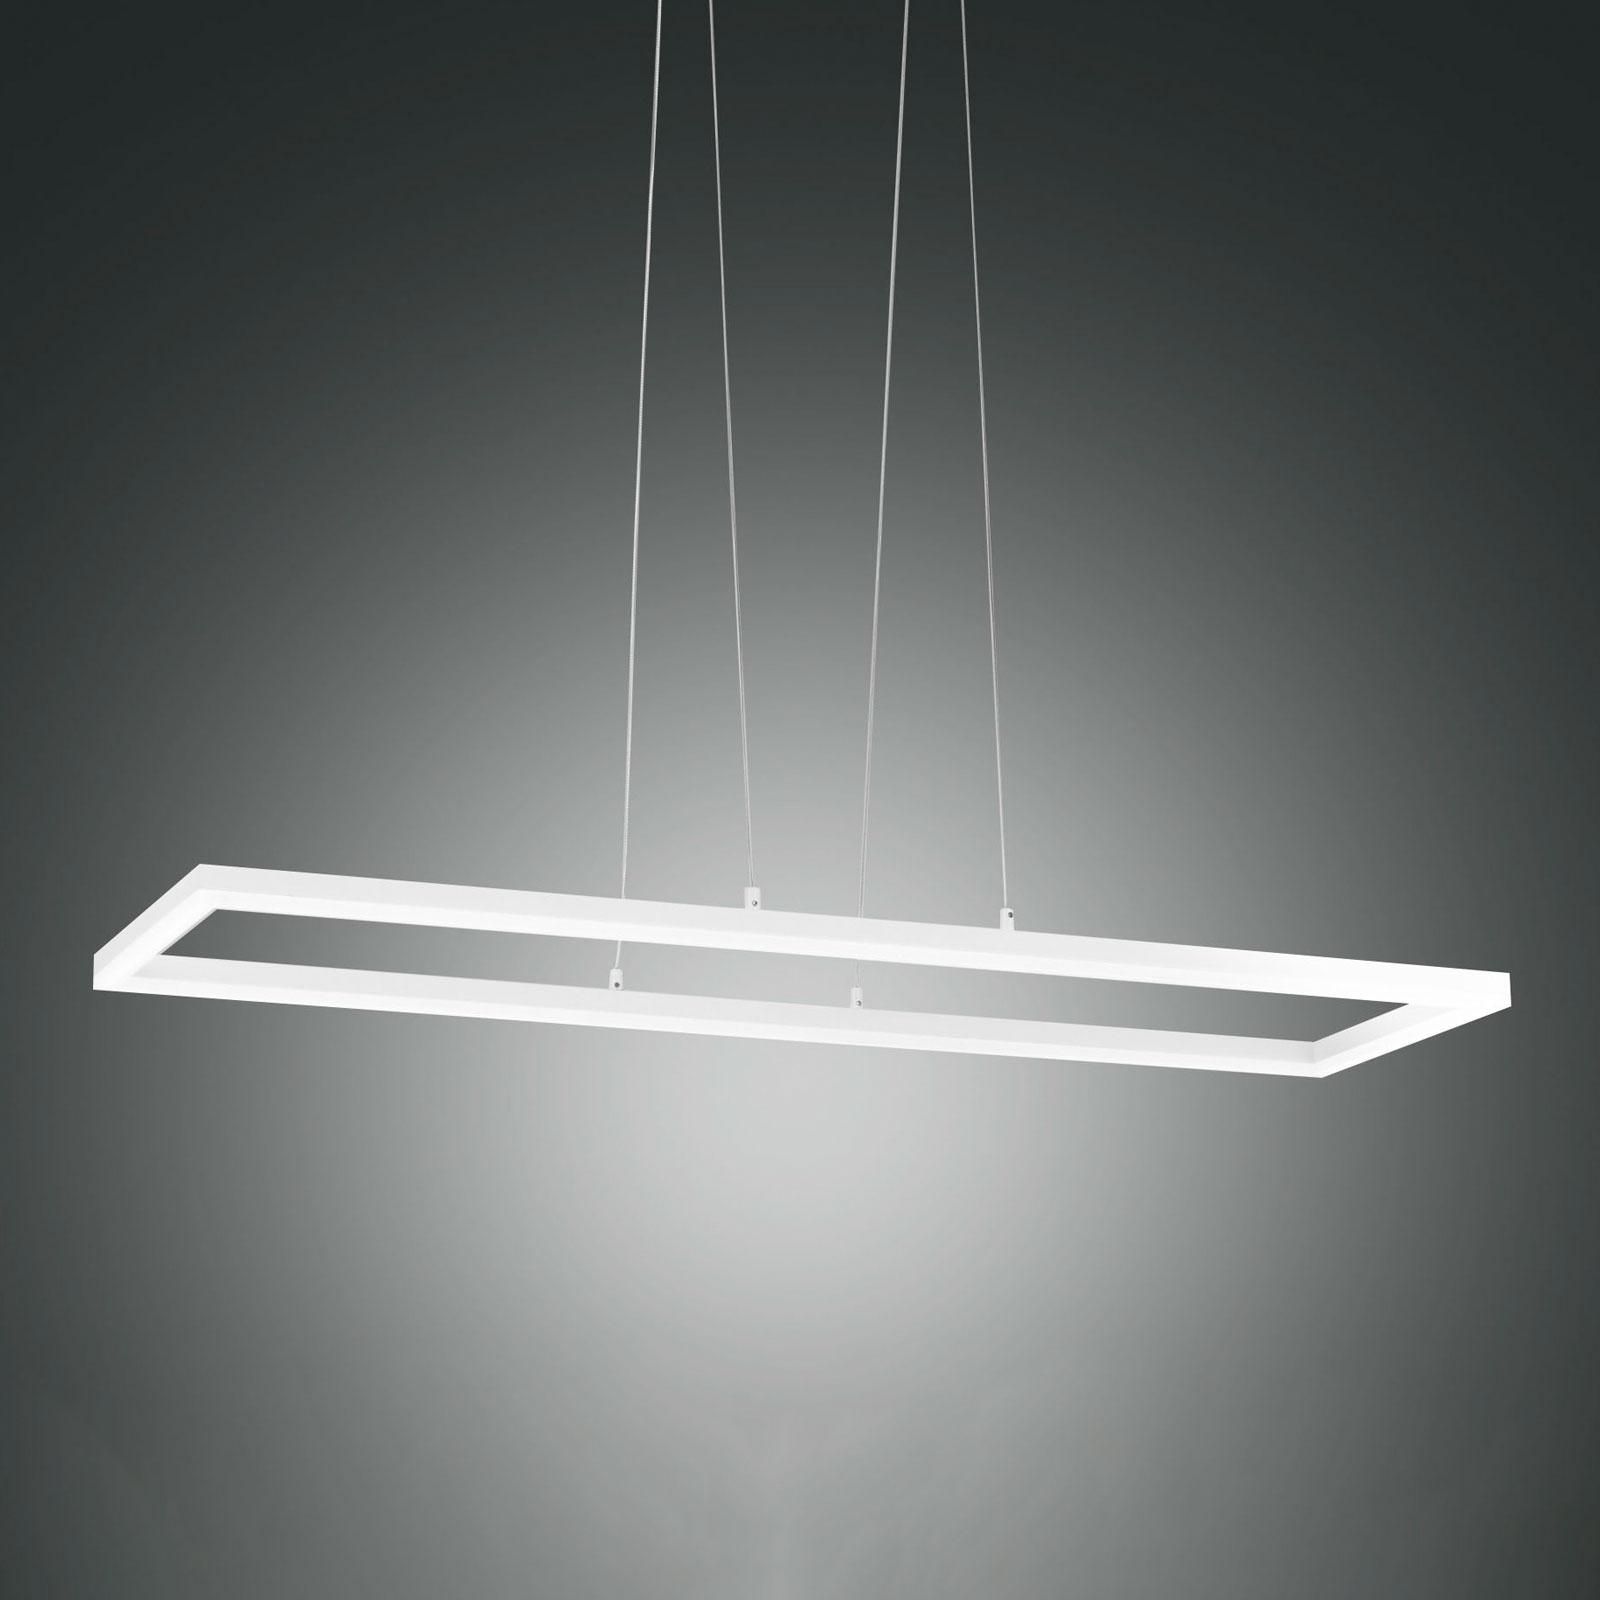 Lampa wisząca LED Bard, 92x32 biała